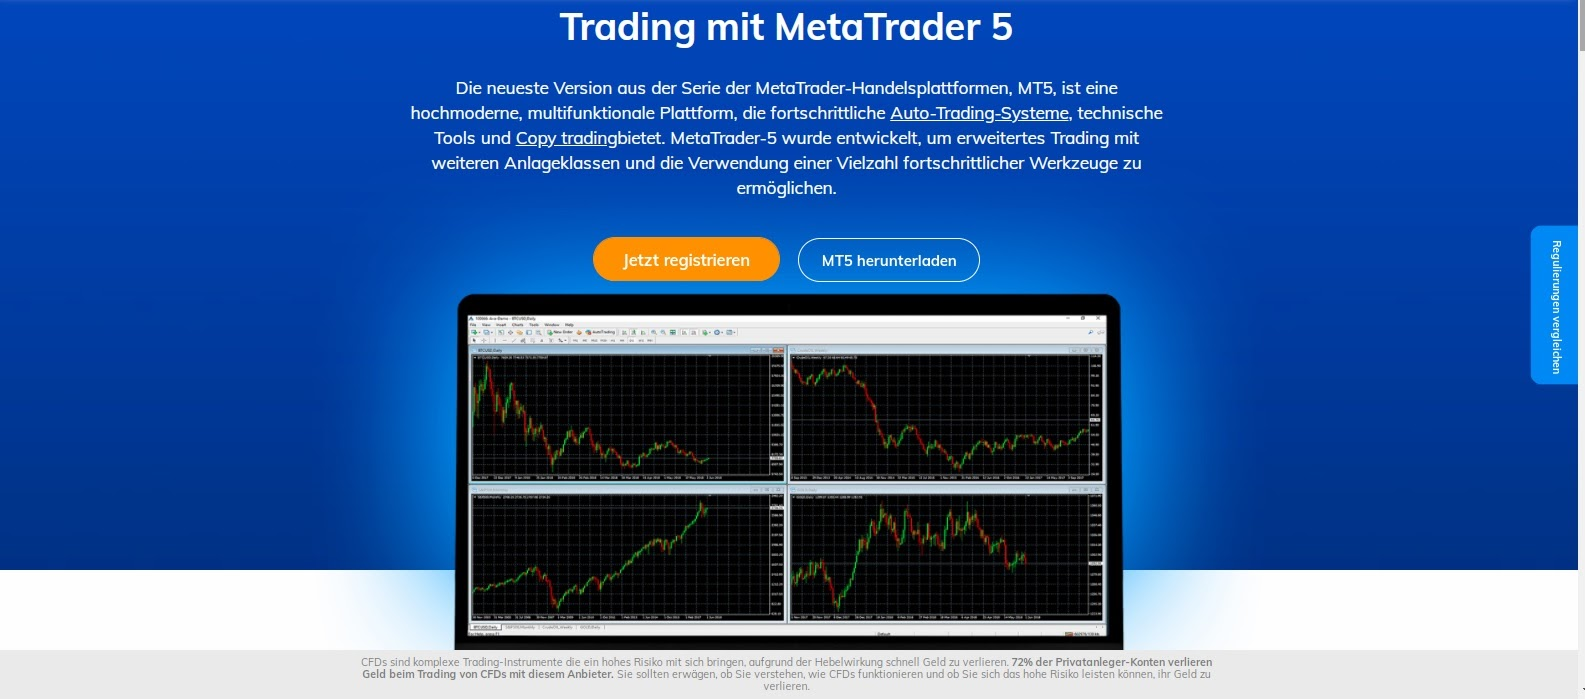 "La plateforme de trading AvaTrade MetaTrader 5 en un coup d'Å""il"